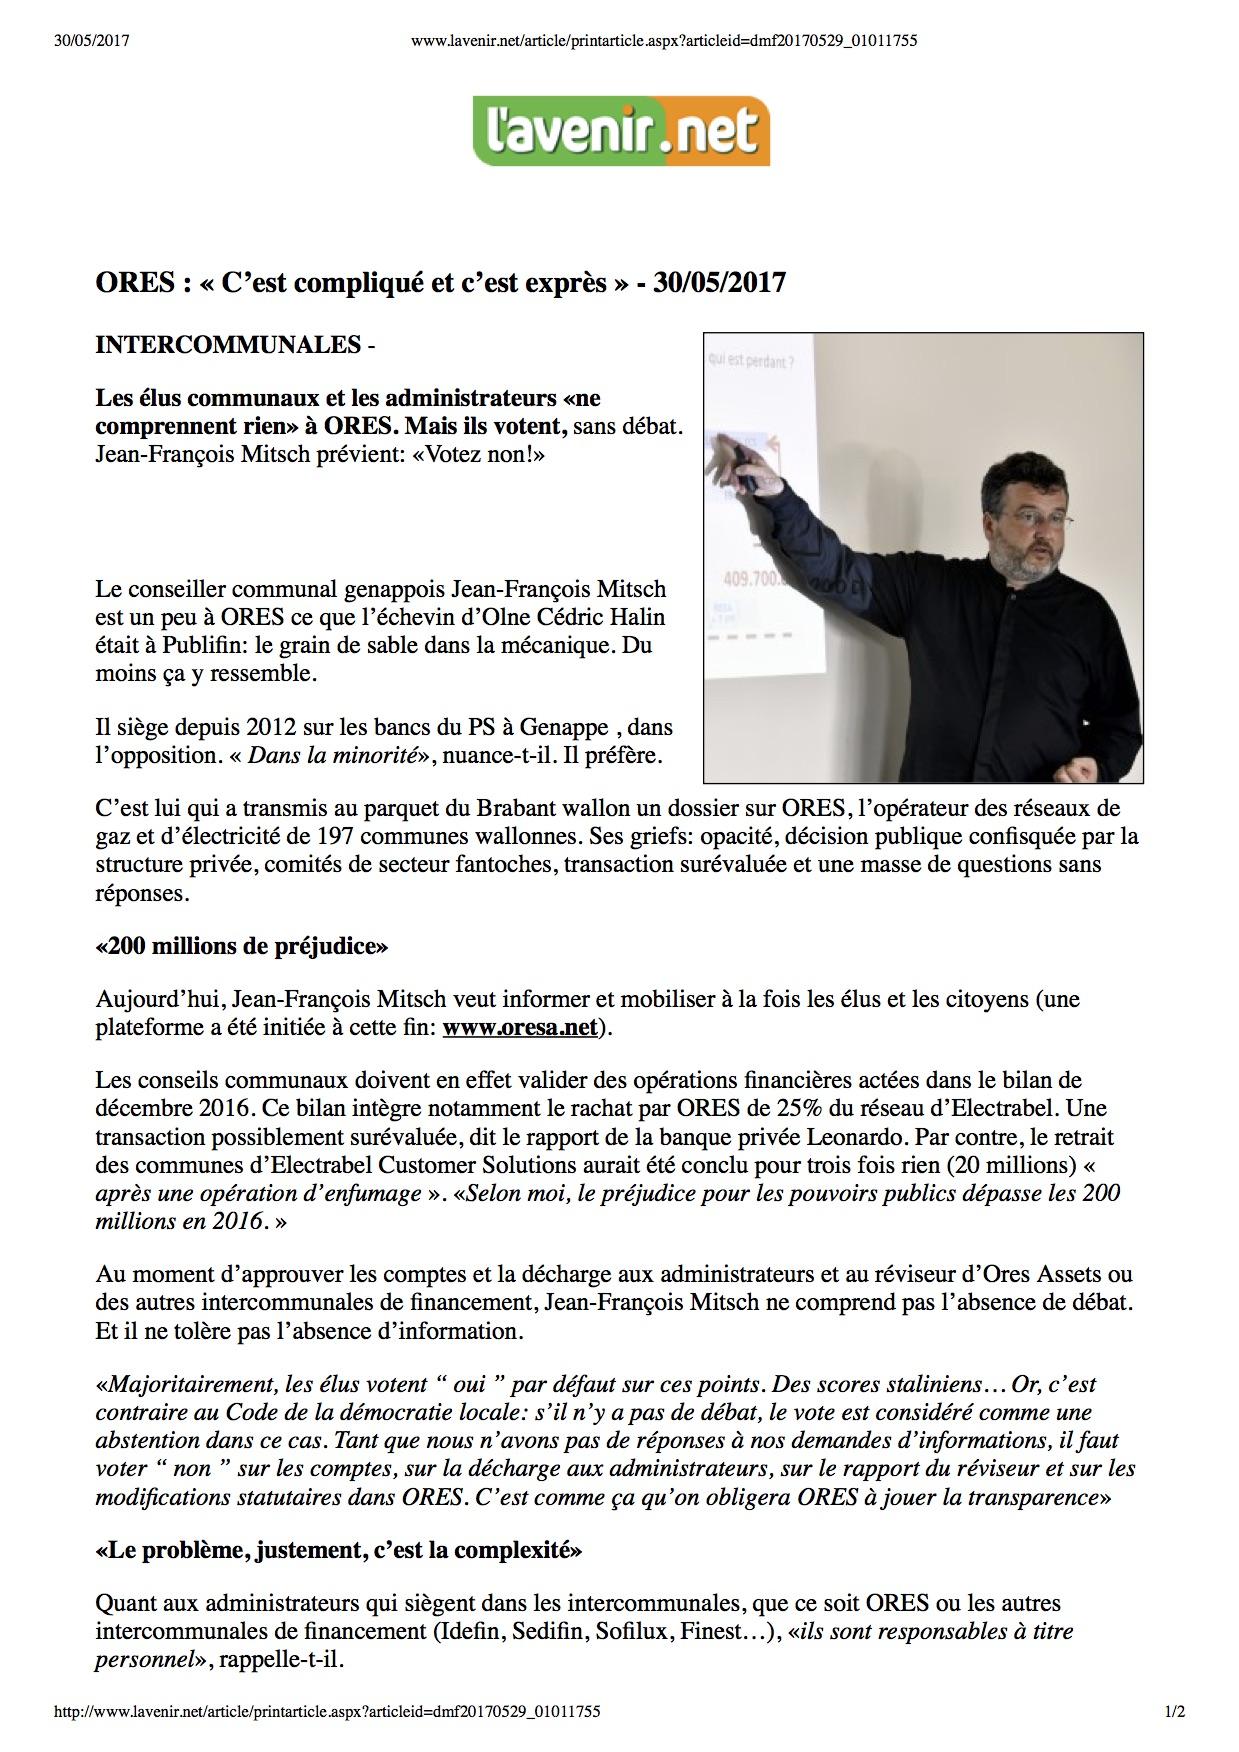 www.lavenir.net_article_printarticle30mai 2017.jpg